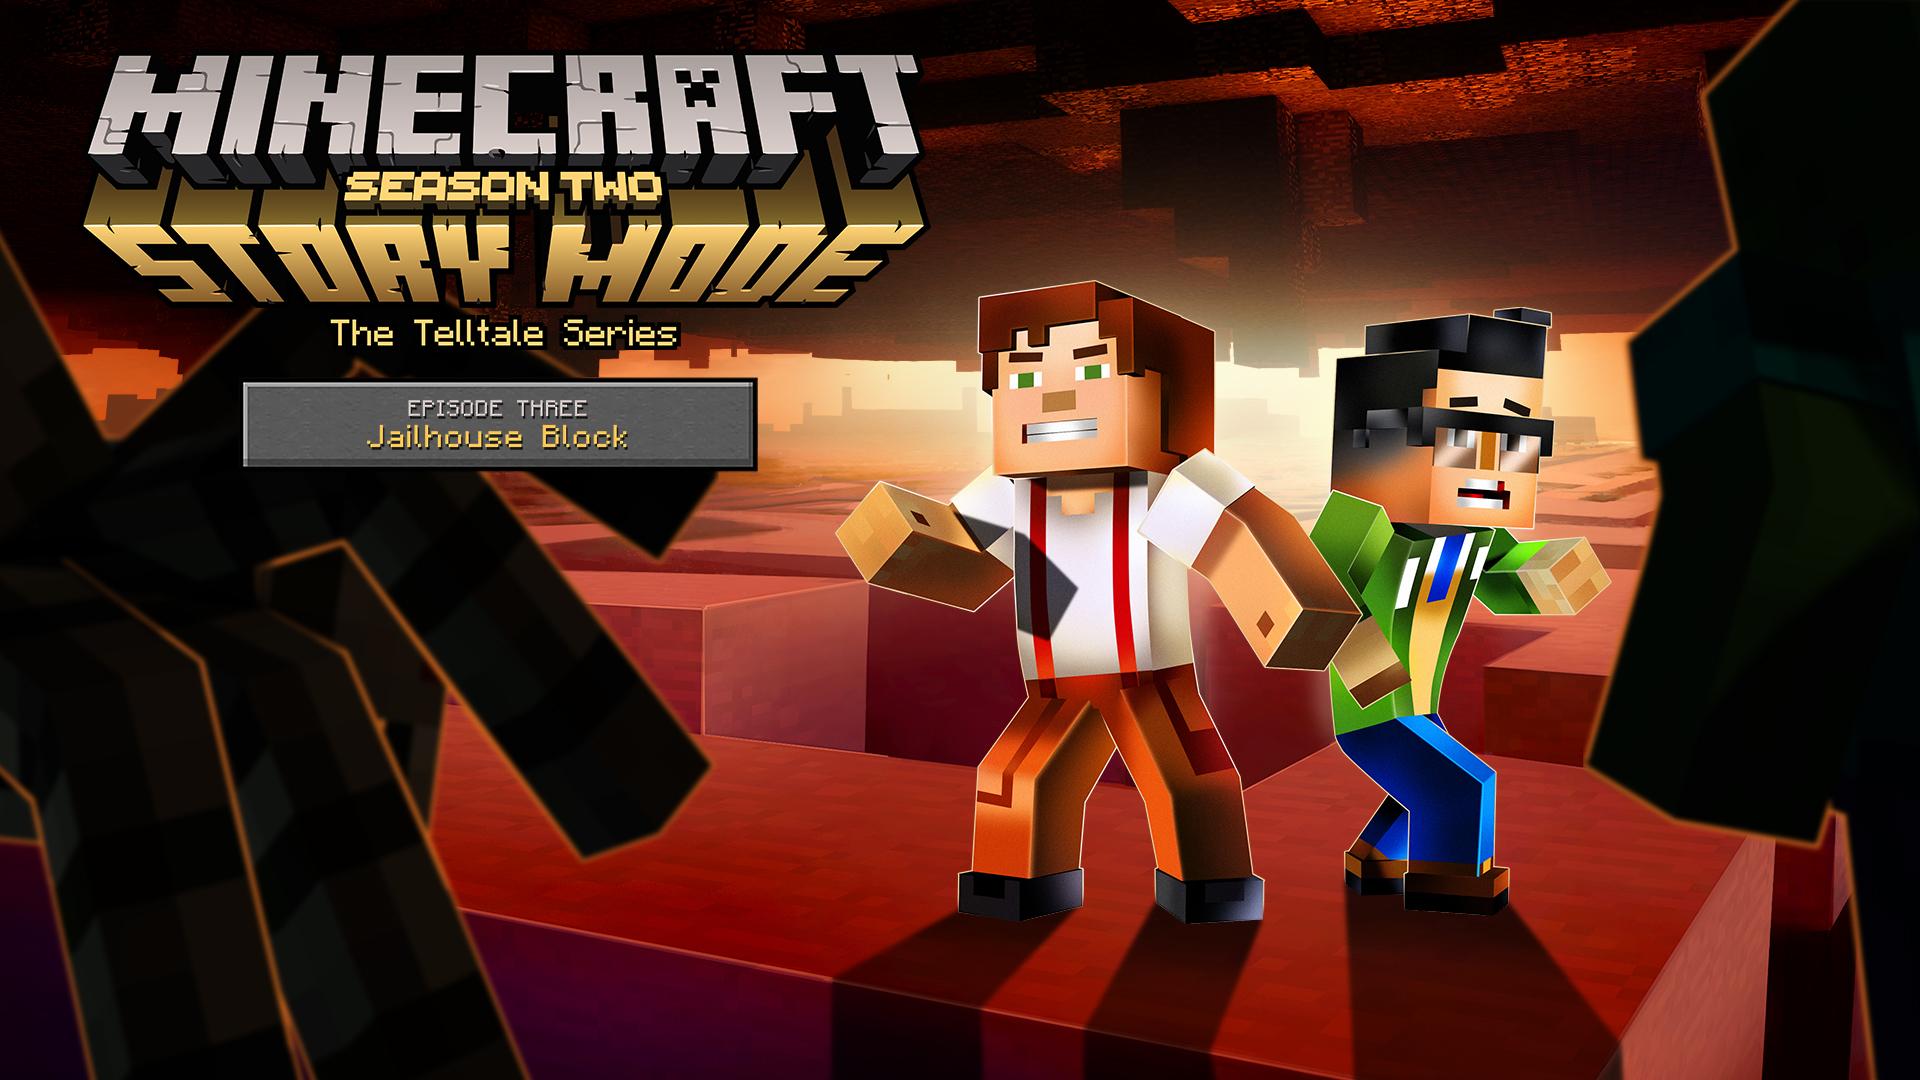 minecraft story mode season two on steam